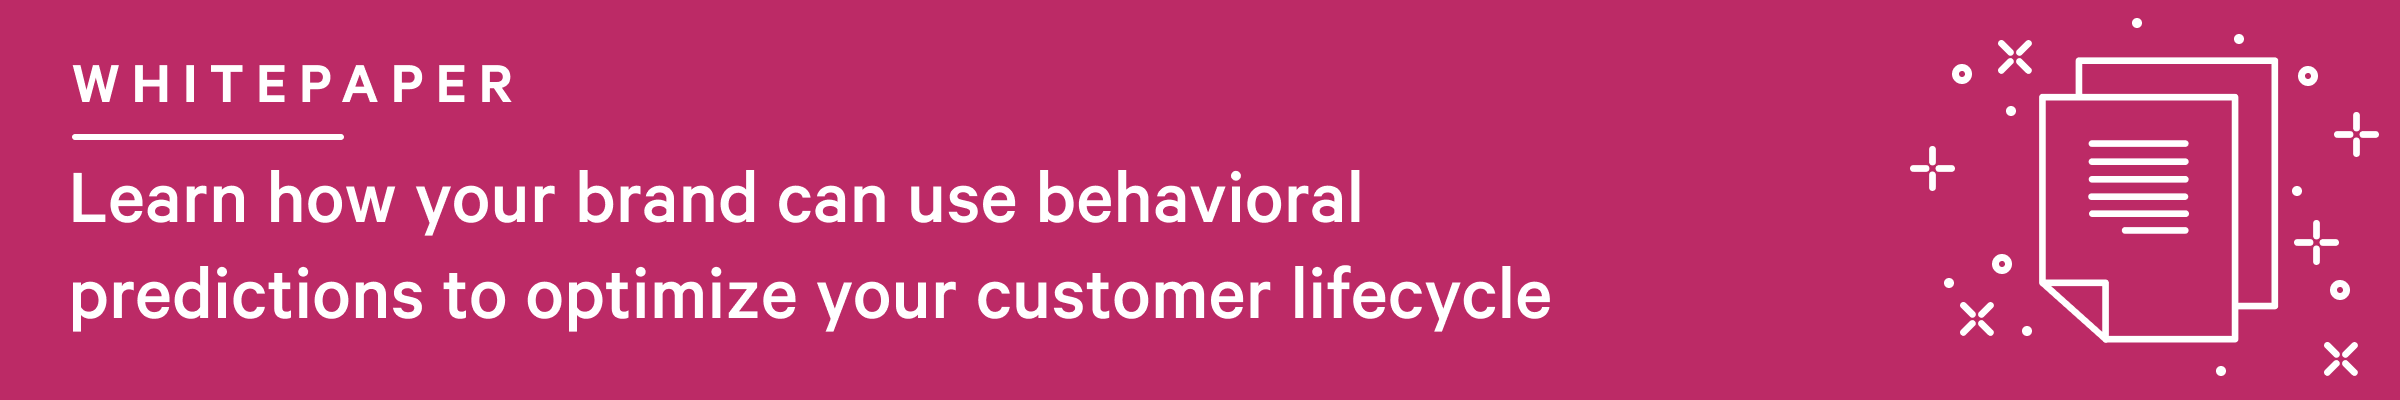 Customer lifecycle optimization whitepaper